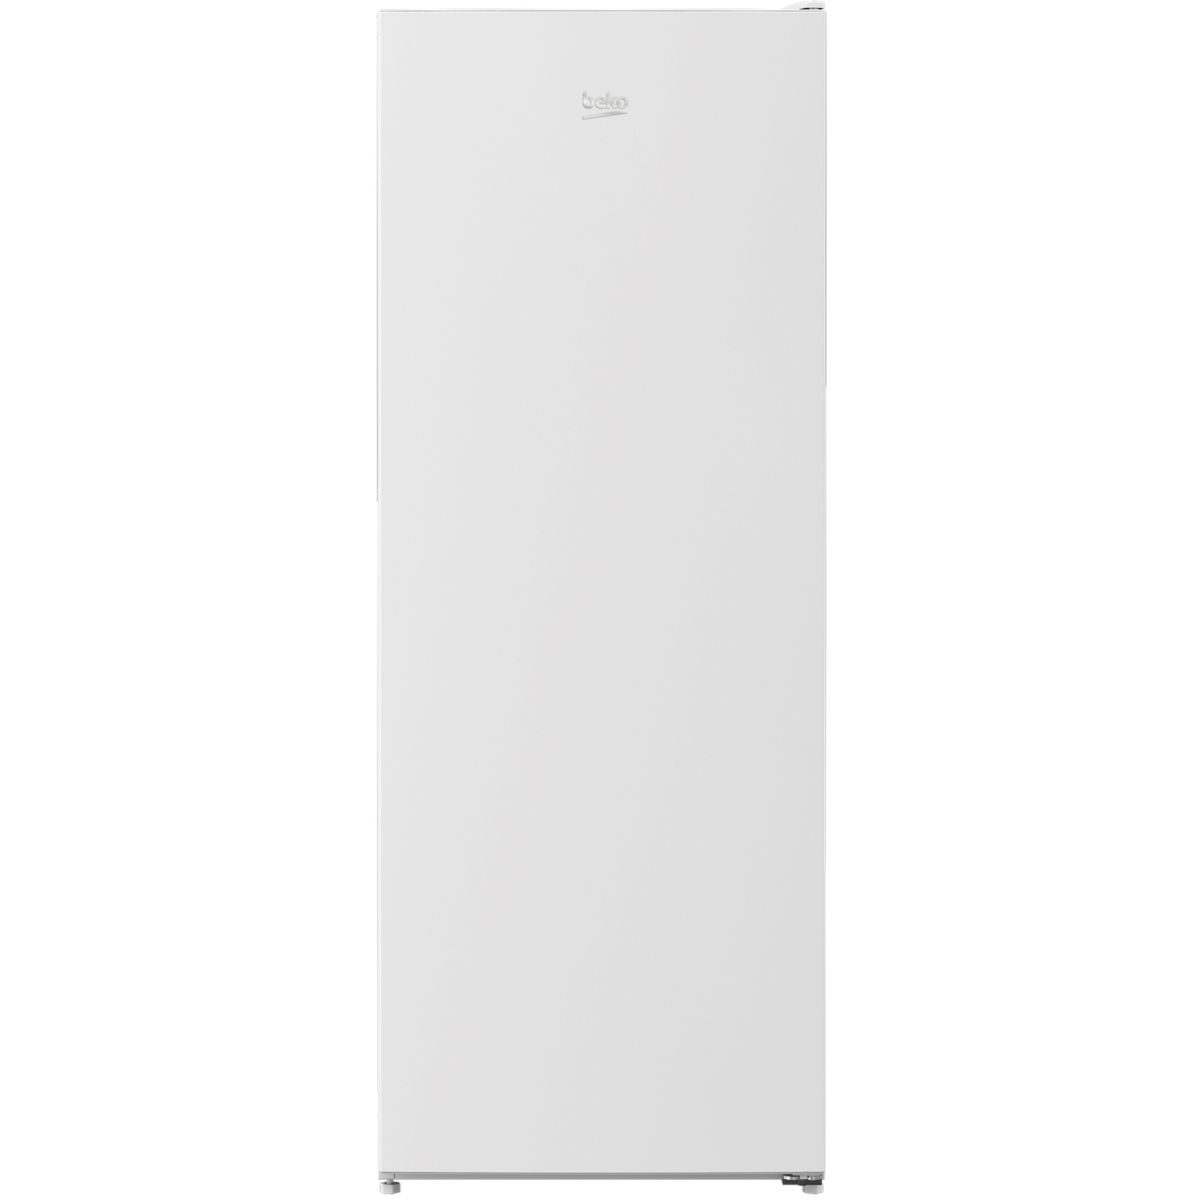 Réfrigérateur 1 porte BEKO RSSA250K20W